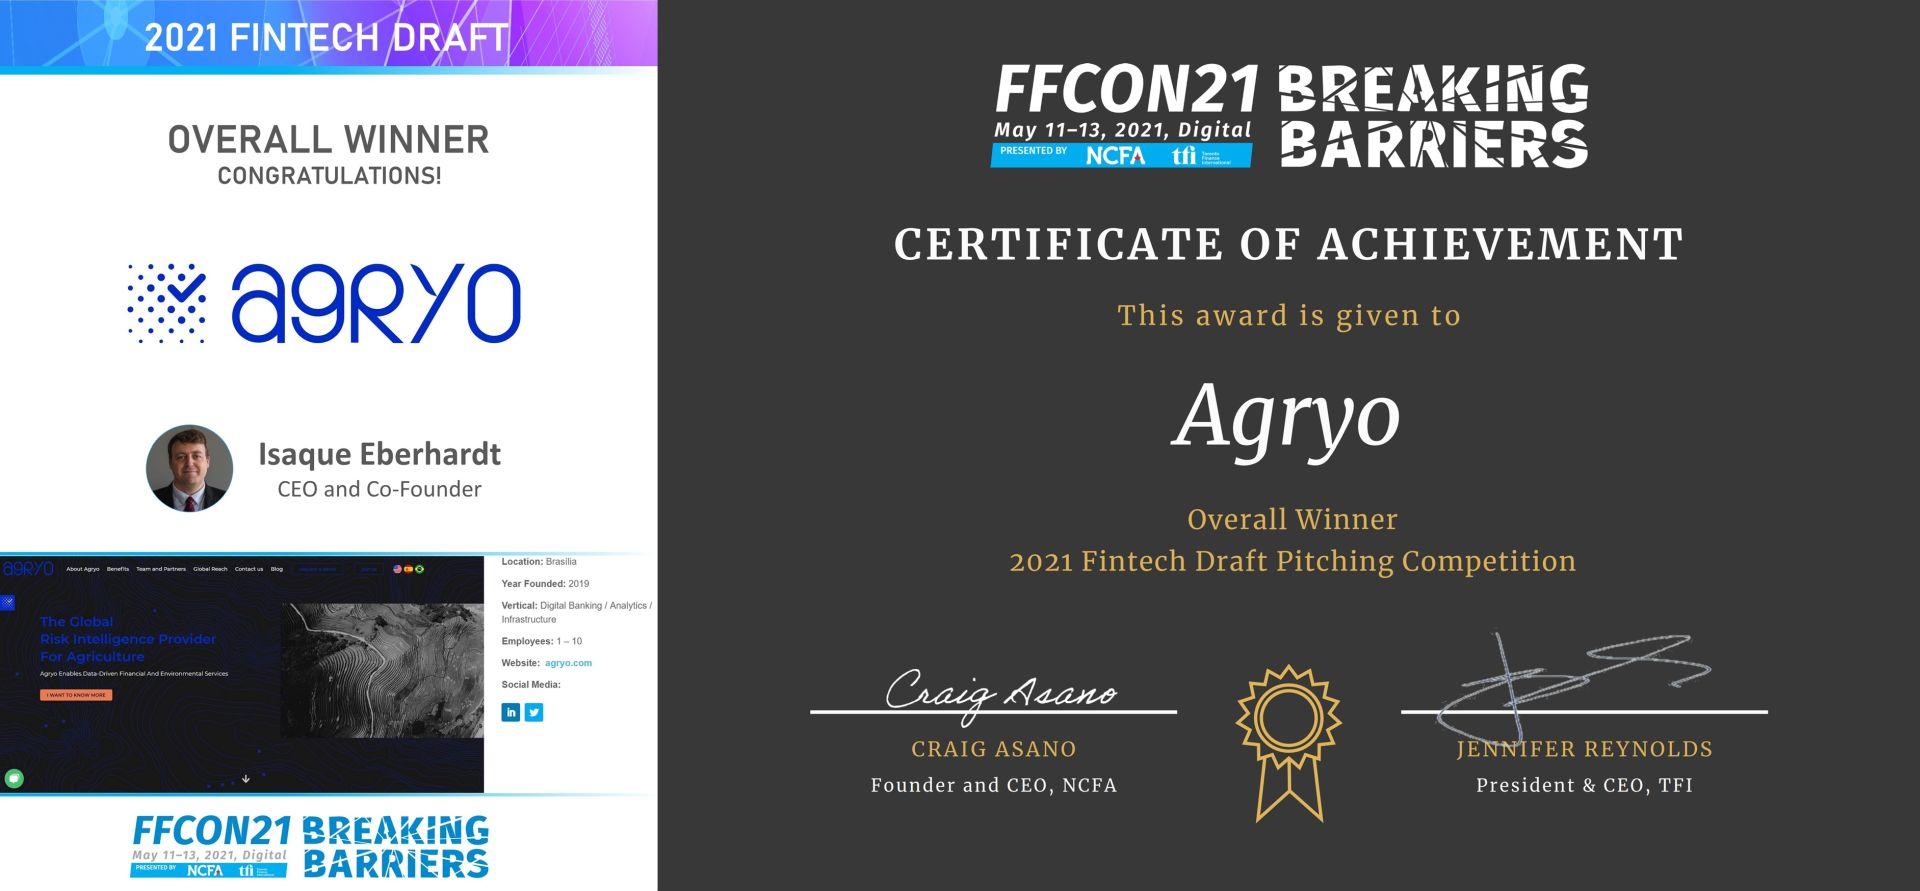 FFCON 2021 Fintech Draft Overall Winner - Agryo